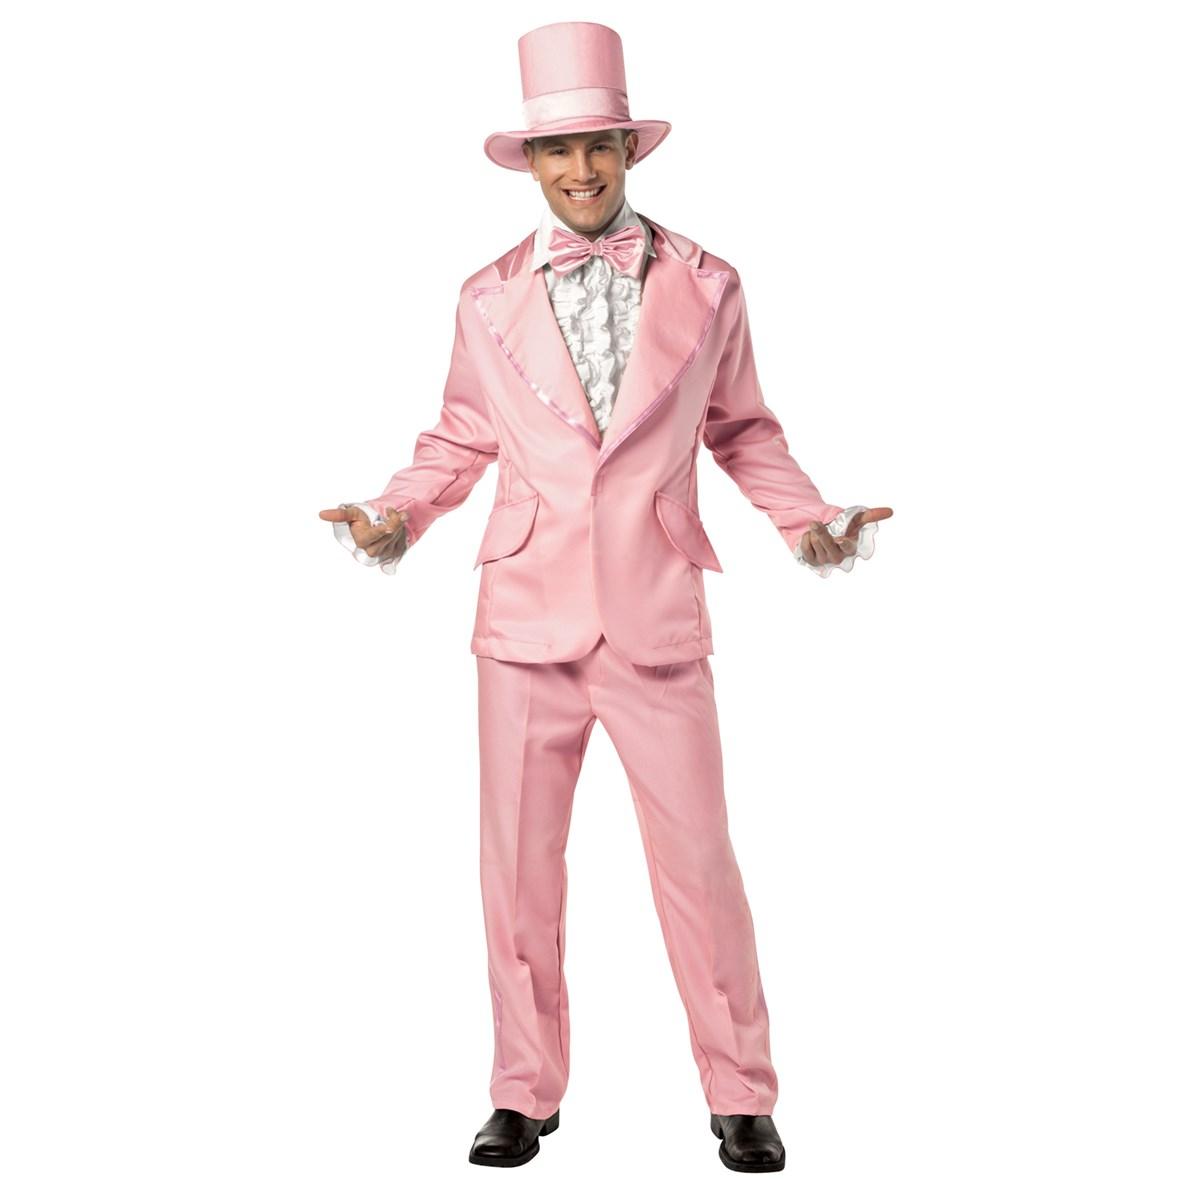 Raoul duke costume